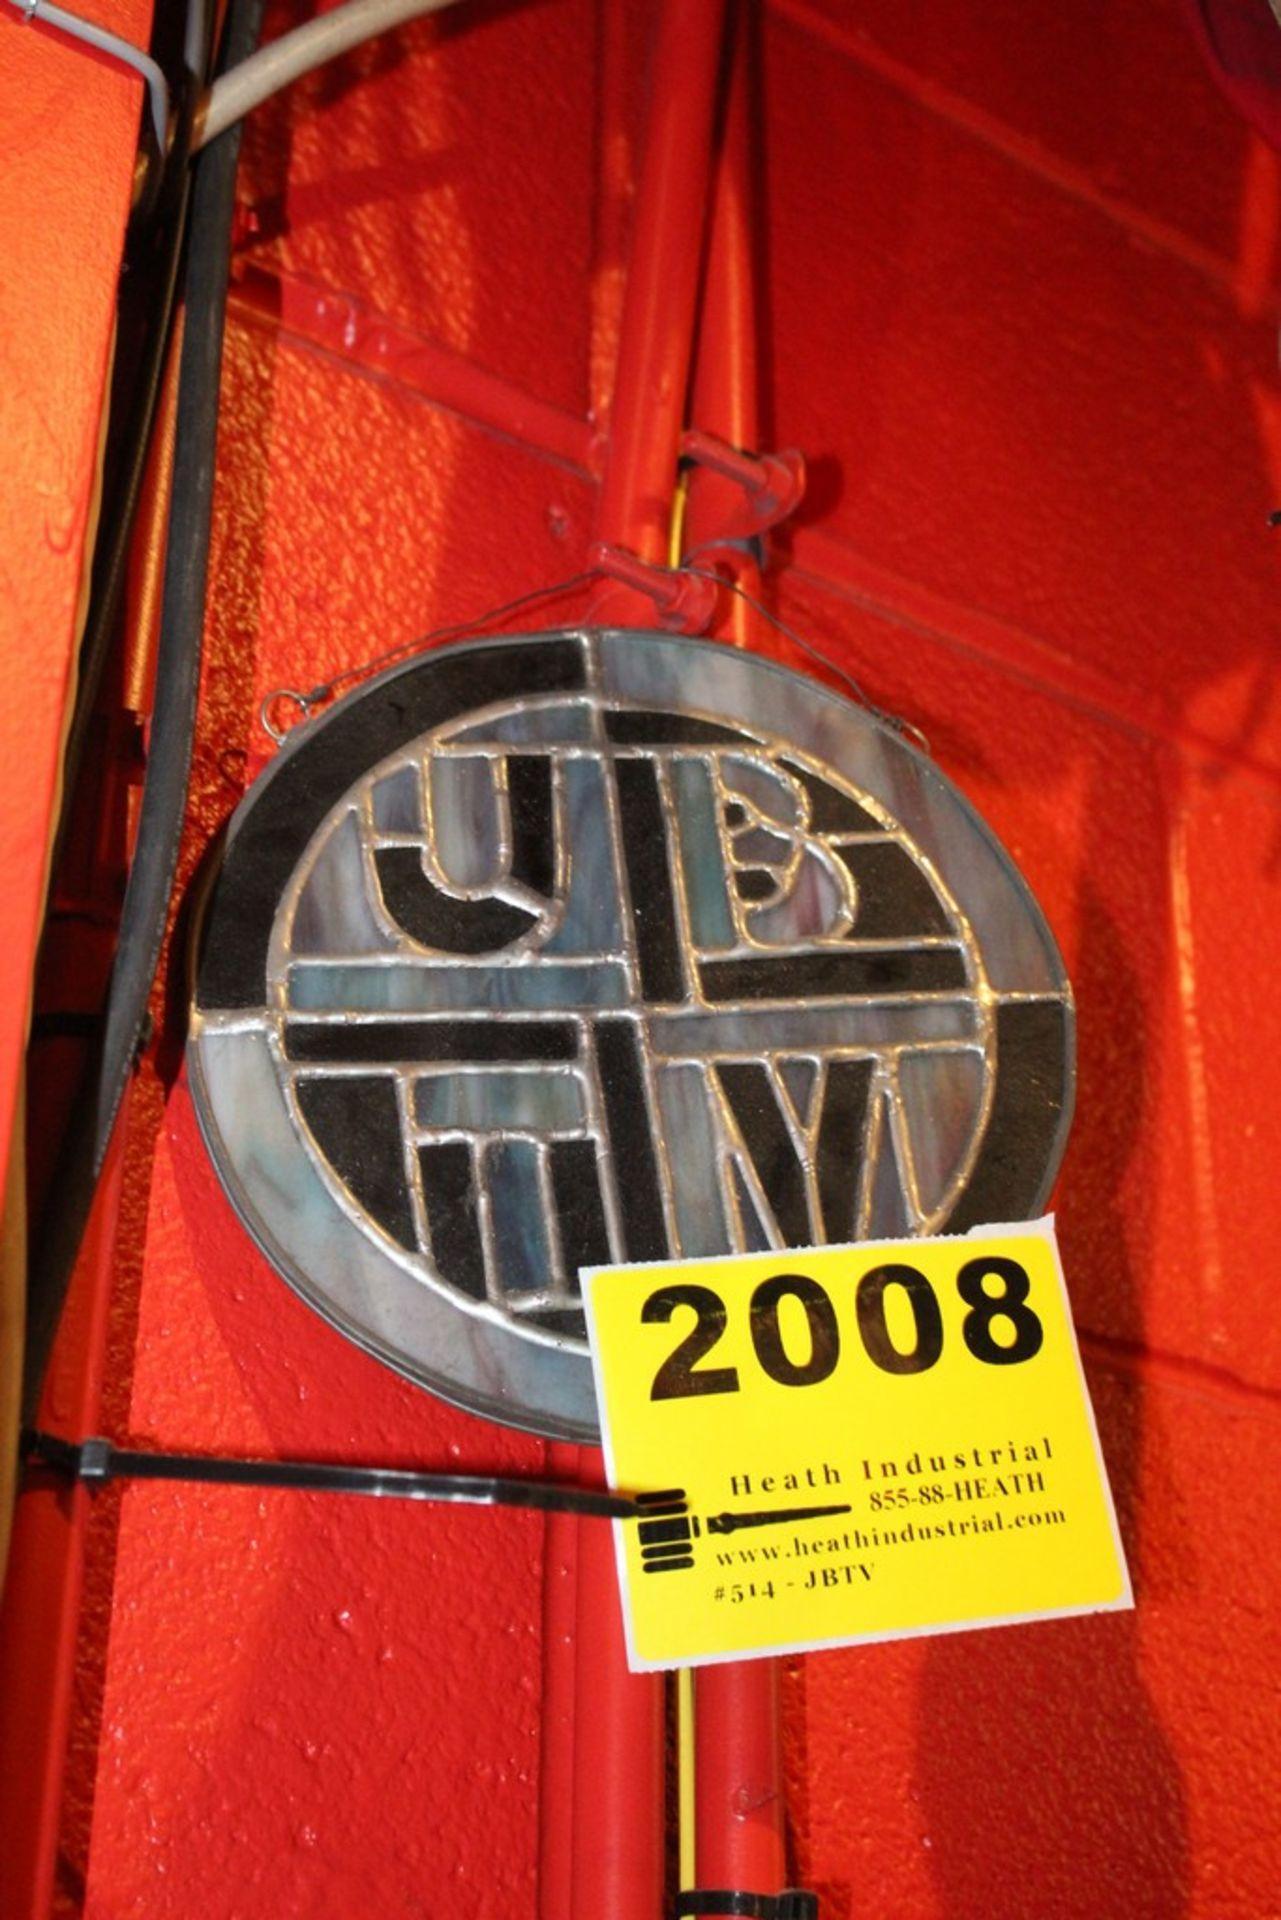 Lot 2008 - JBTV Stained Glass Window Decoration